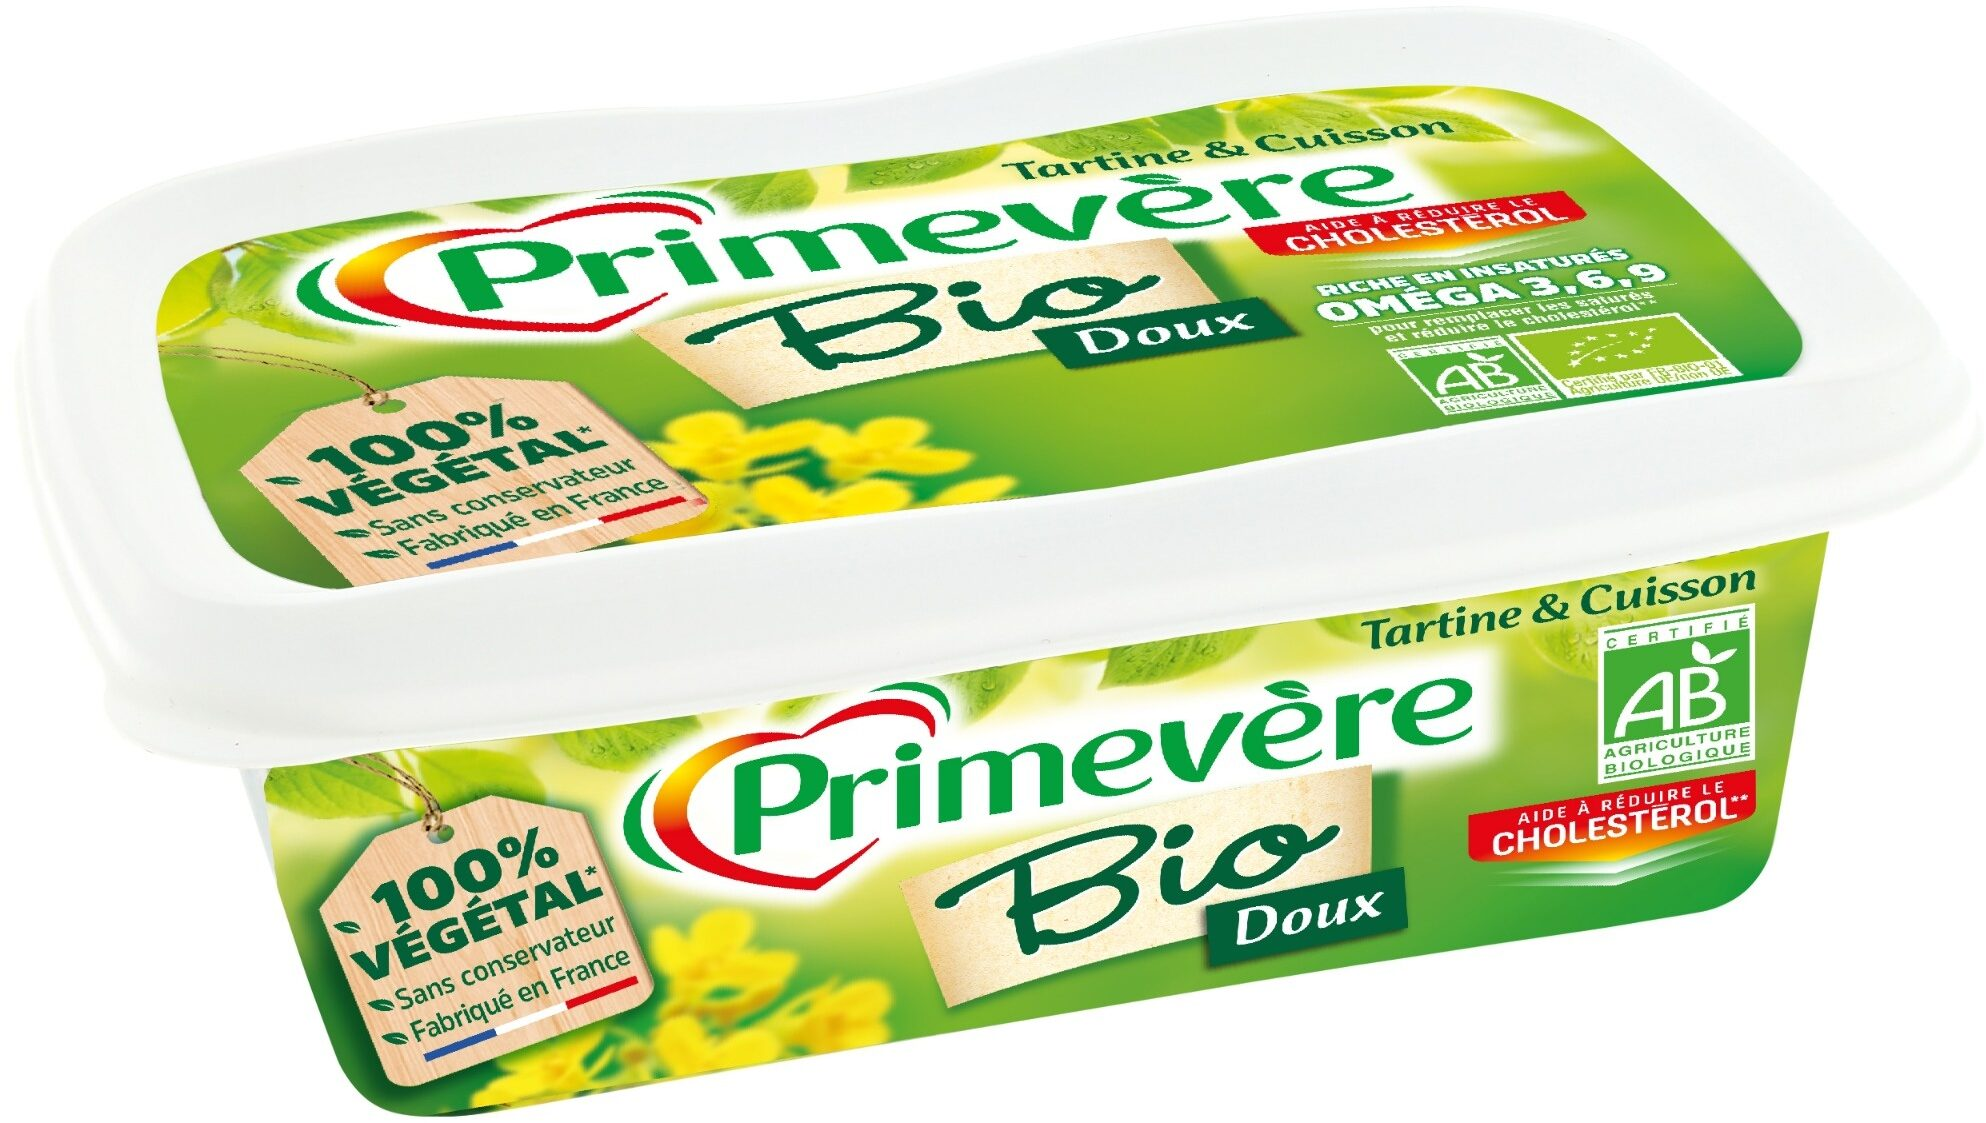 Primevère Bio doux Tartine & Cuisson - Producto - fr